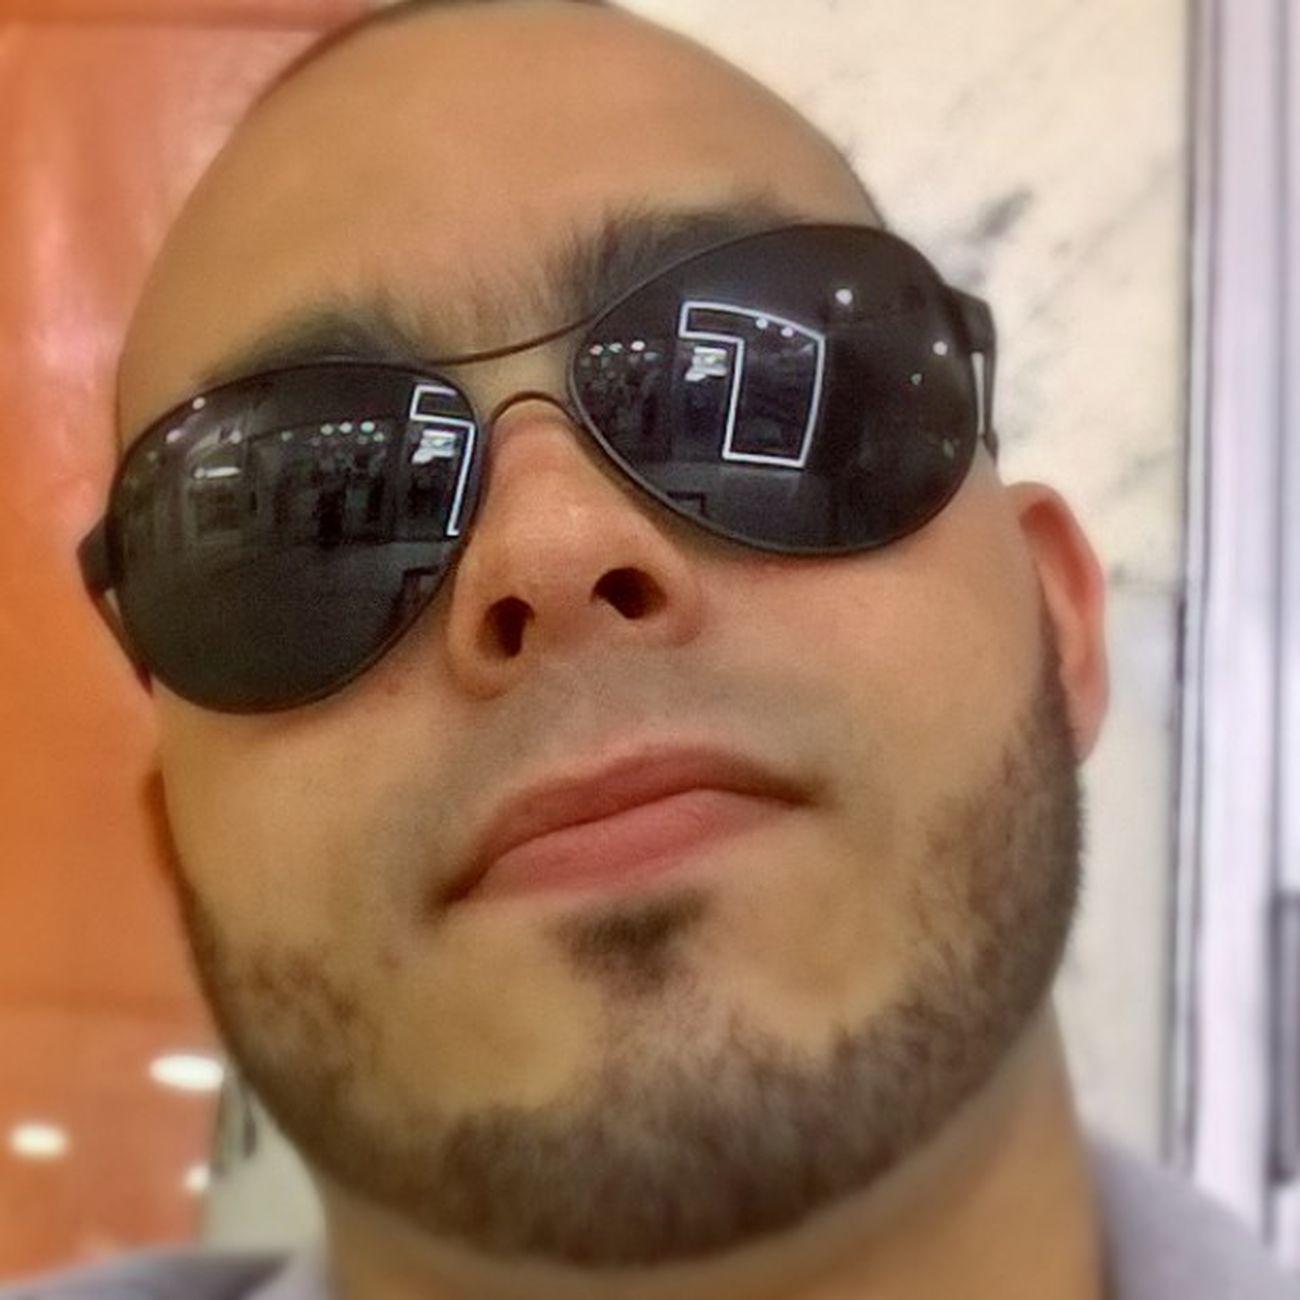 Work Nofilter Fridays Sunglasses